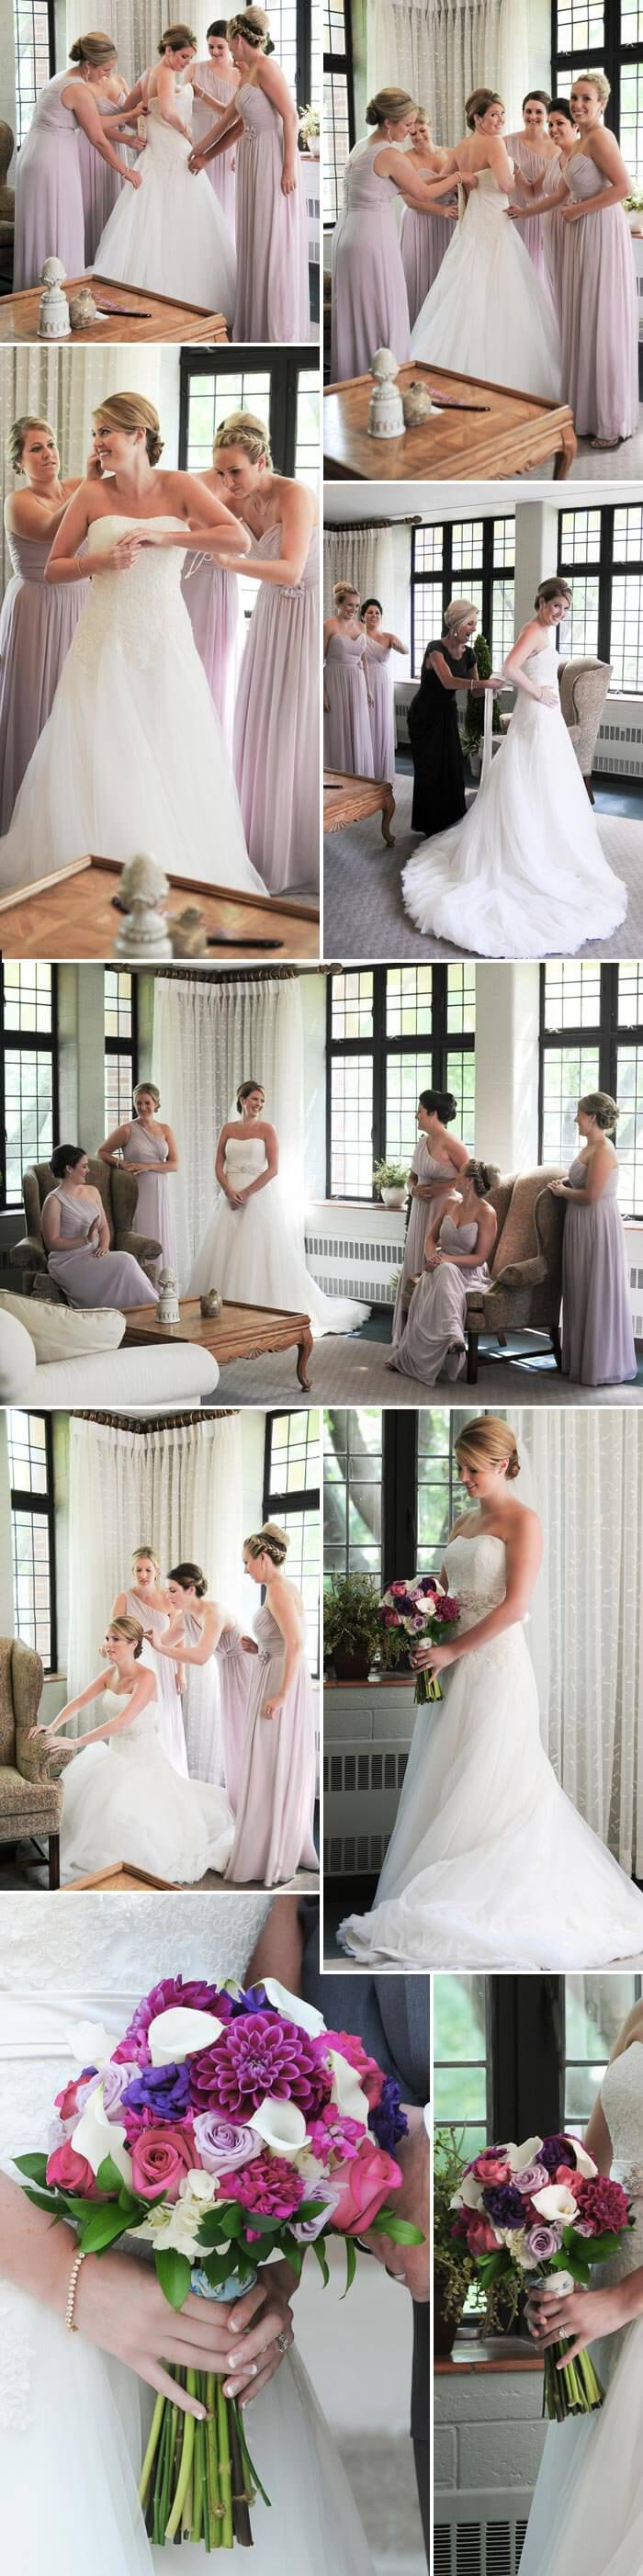 Braut mit Brautjungfern